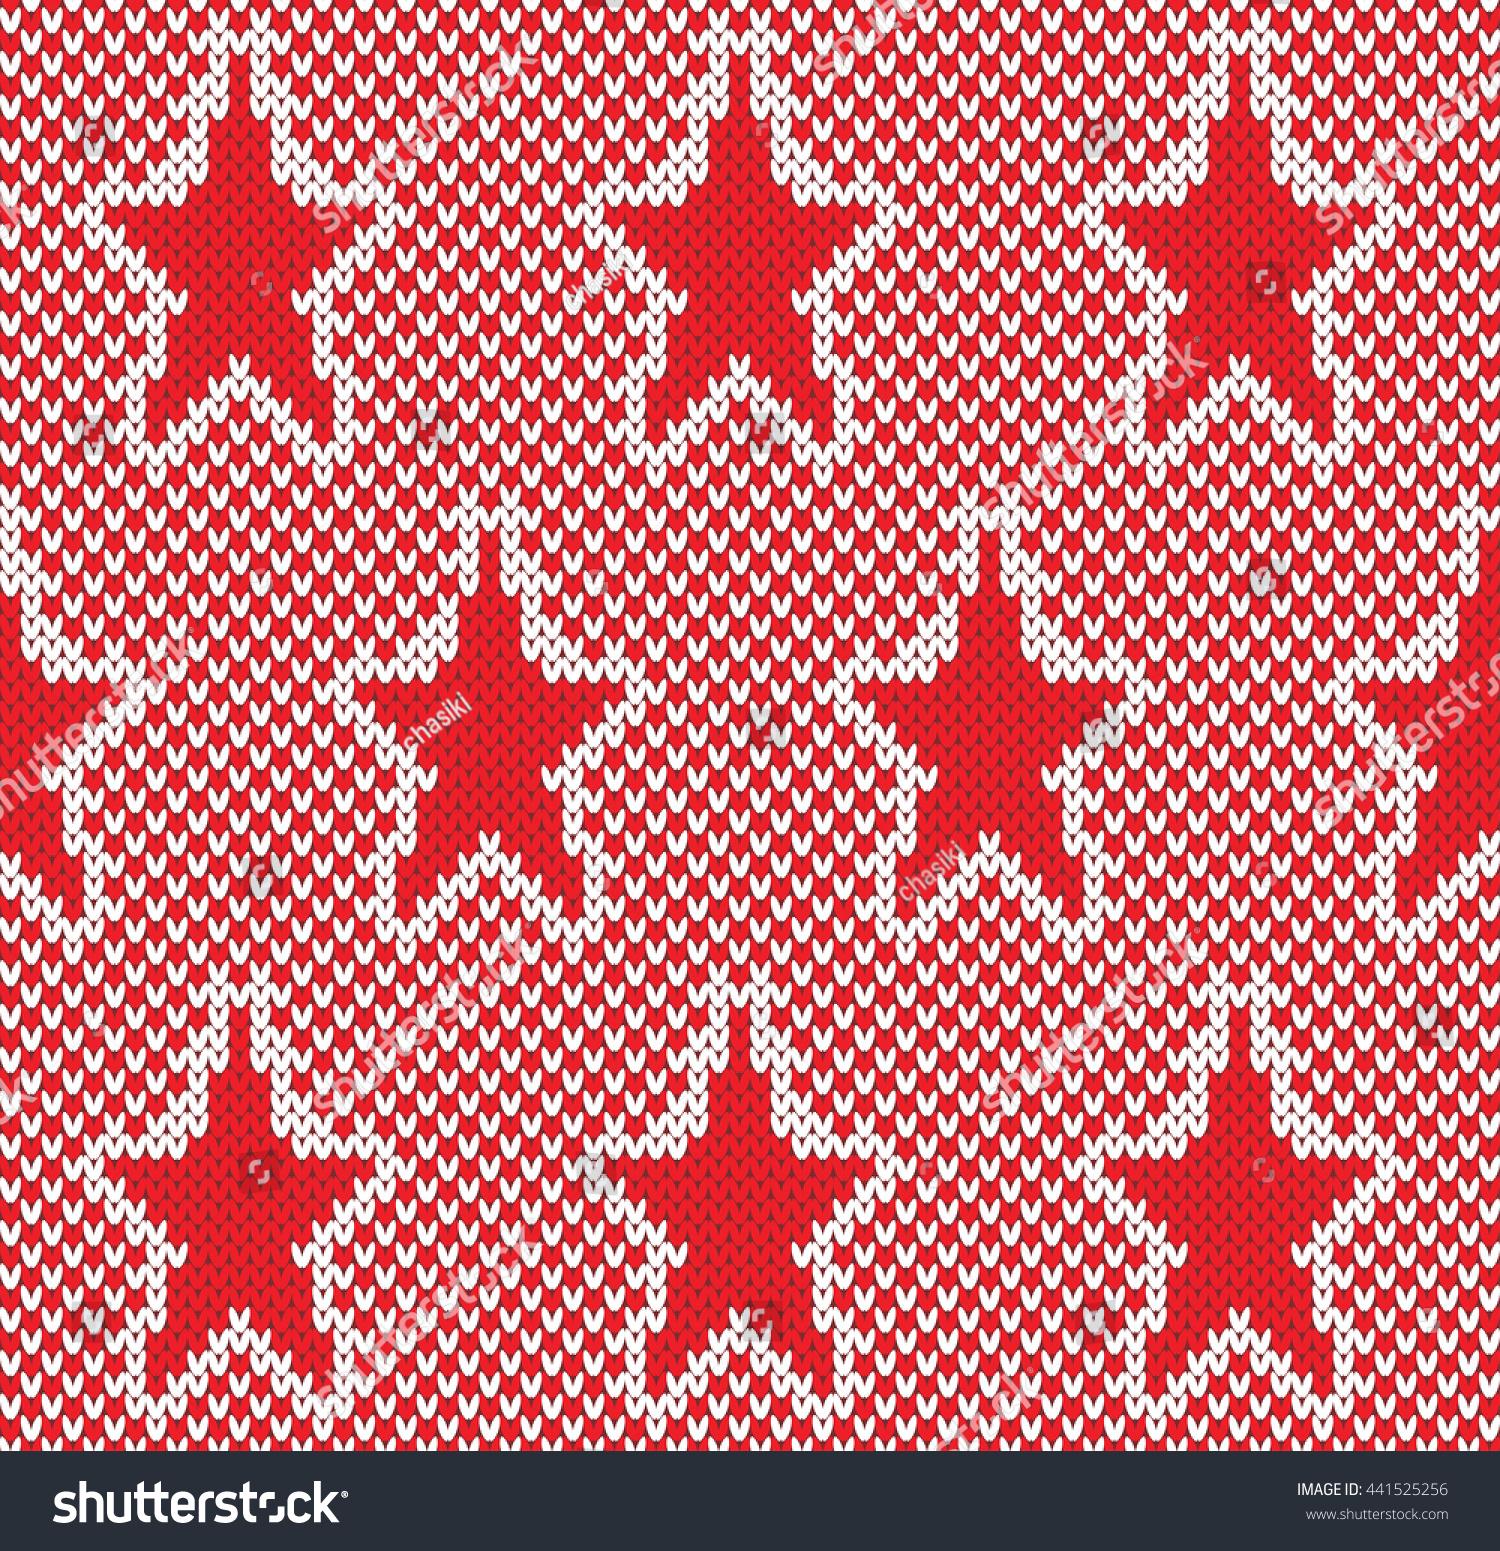 Star Fairisle Seamless Knitting Pattern Stock Vector HD (Royalty ...